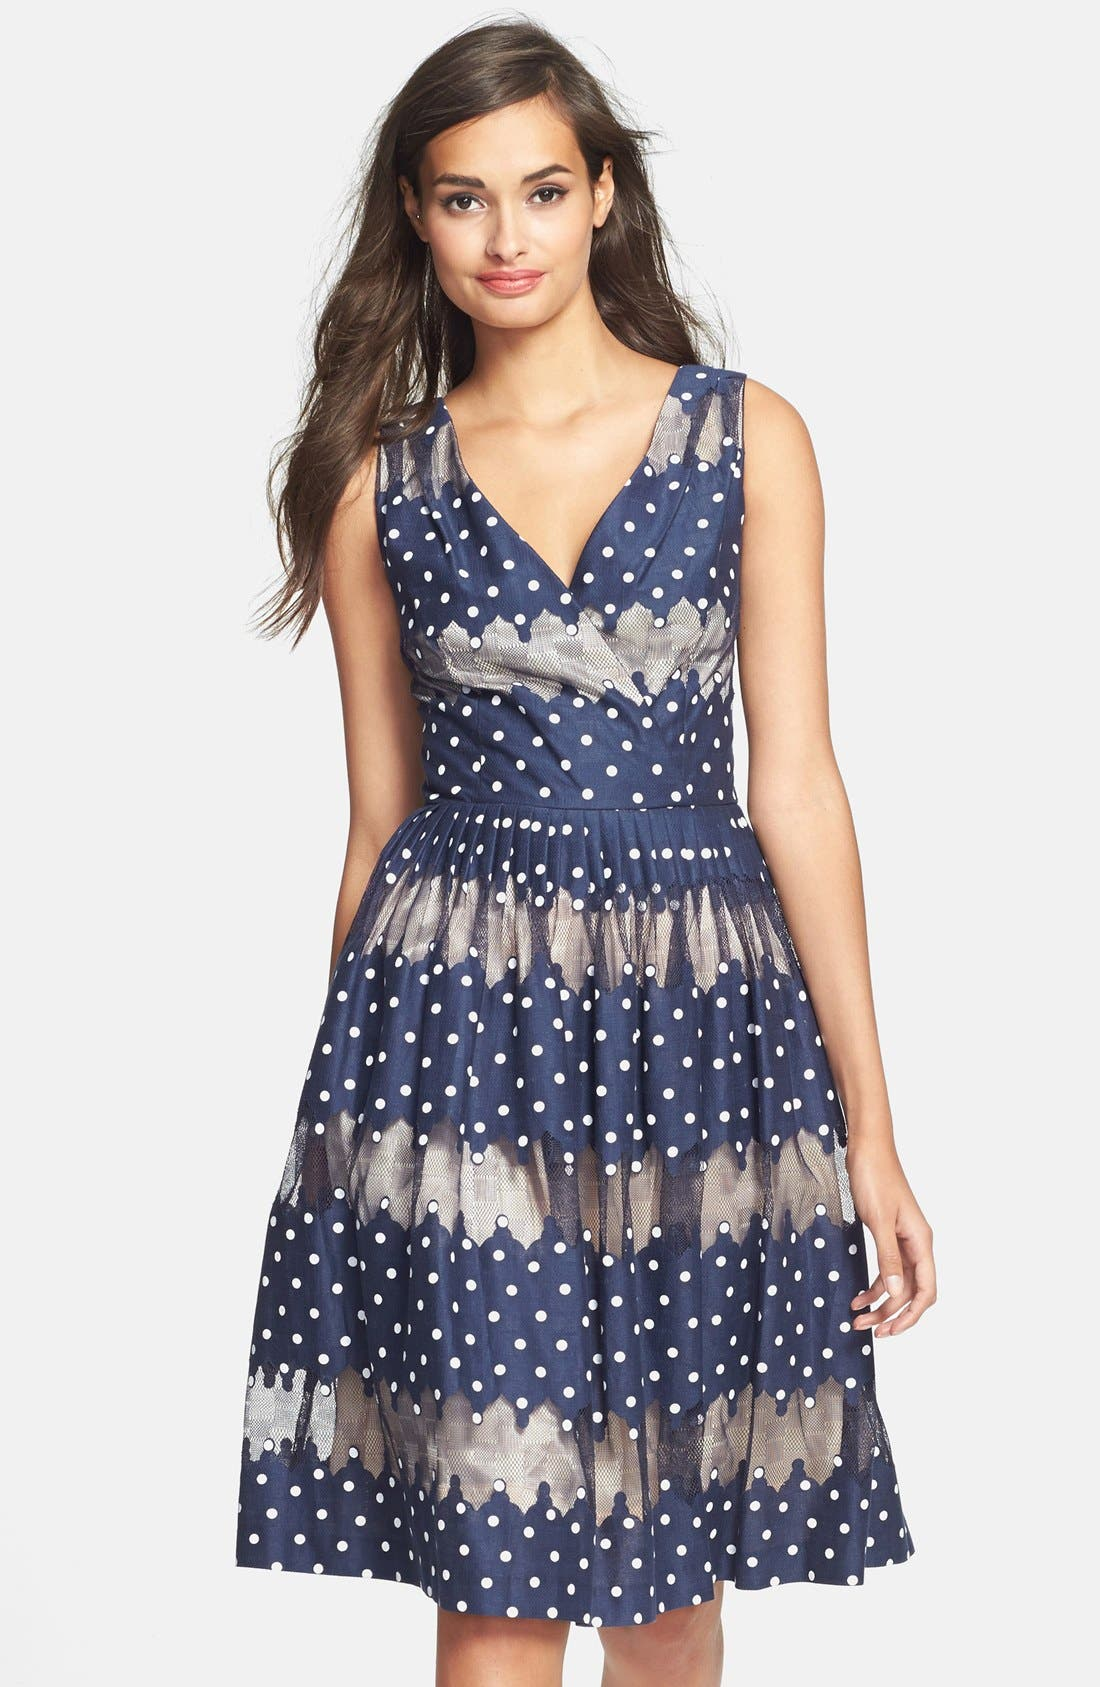 Alternate Image 1 Selected - Maggy London Burnout Dot Fit & Flare Dress